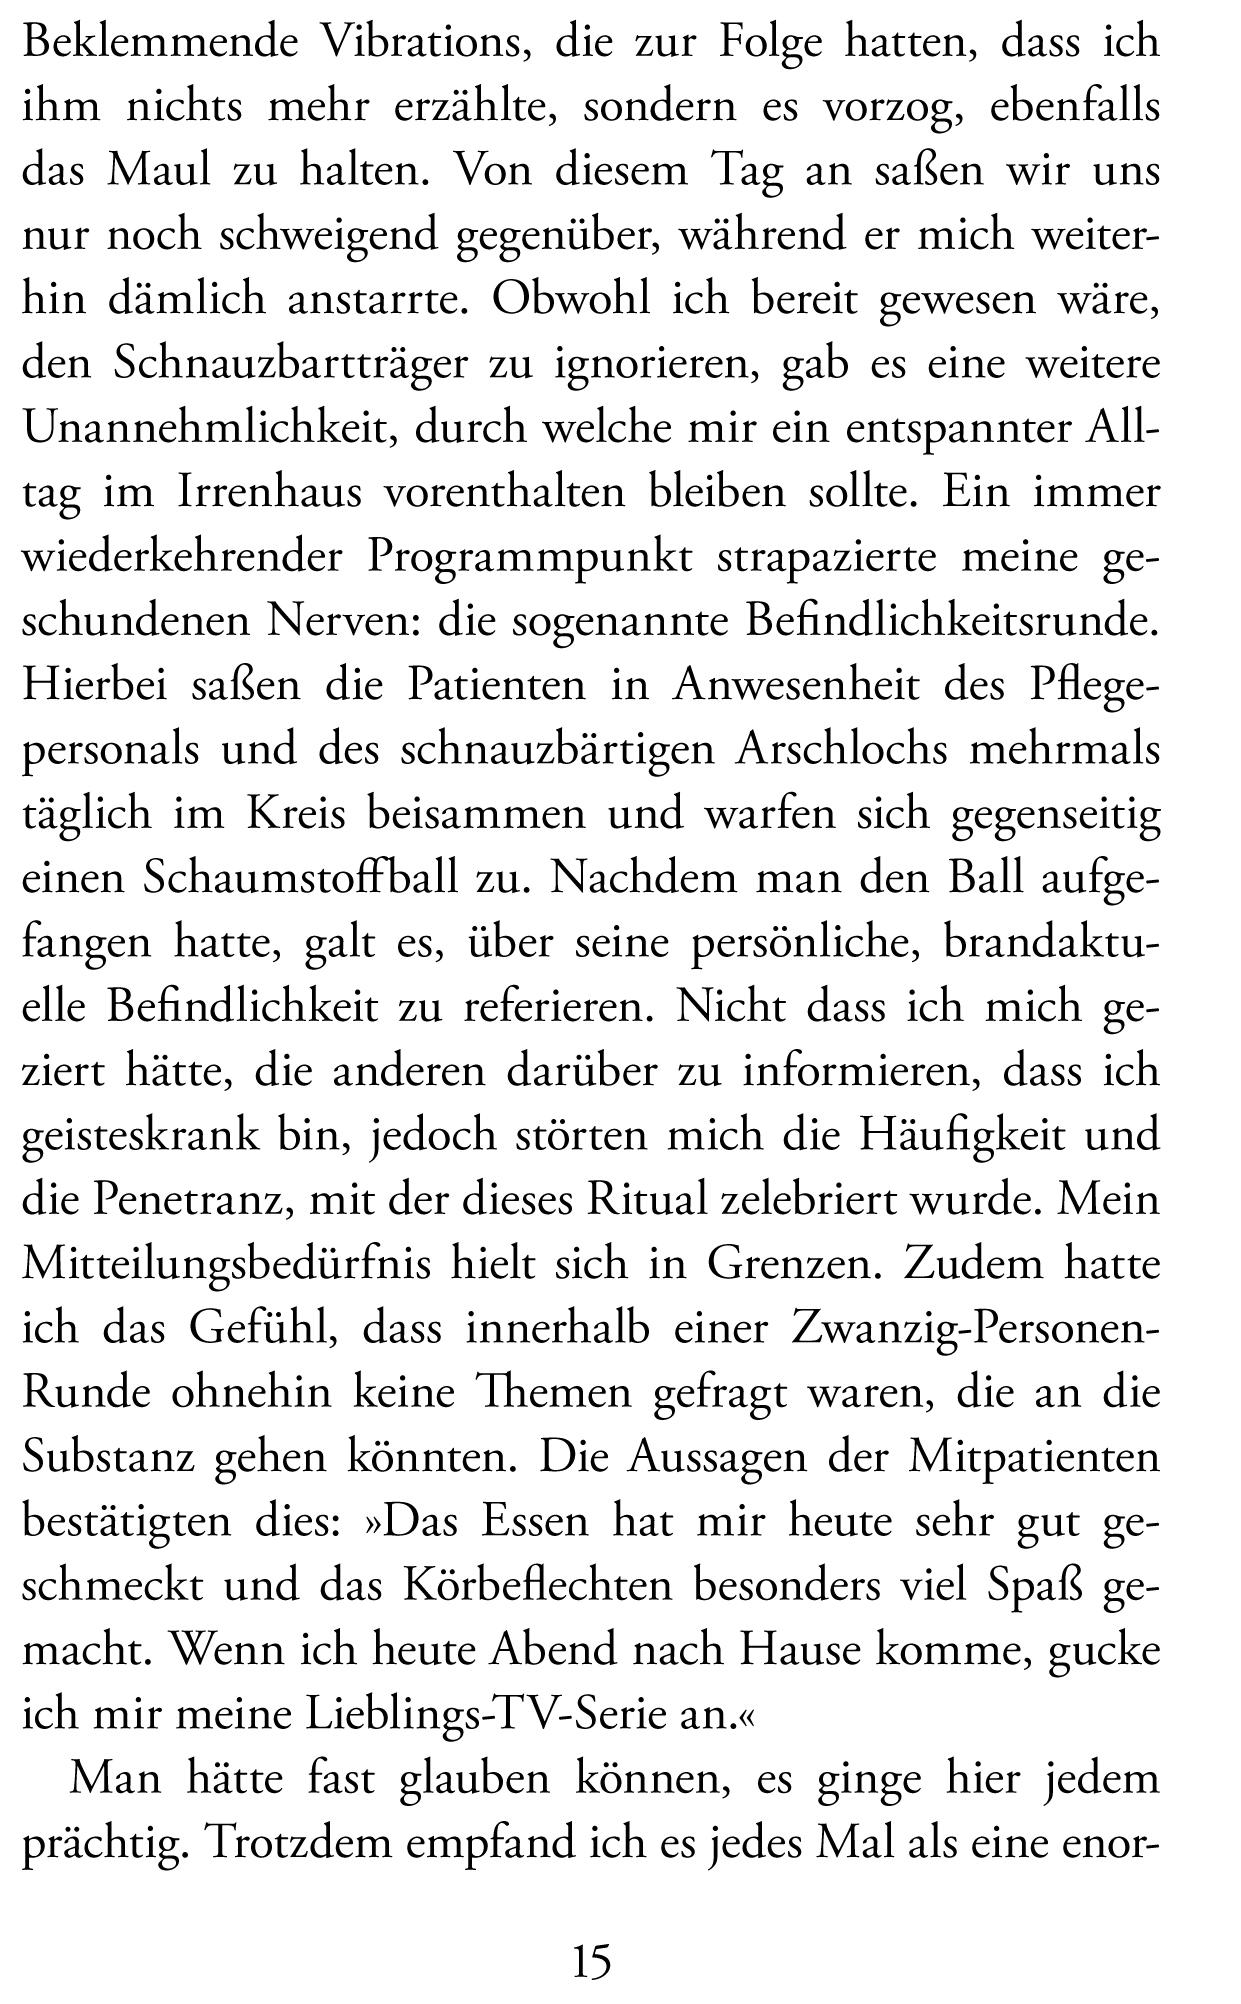 alex_graebeldinger_verloren_im_all_2